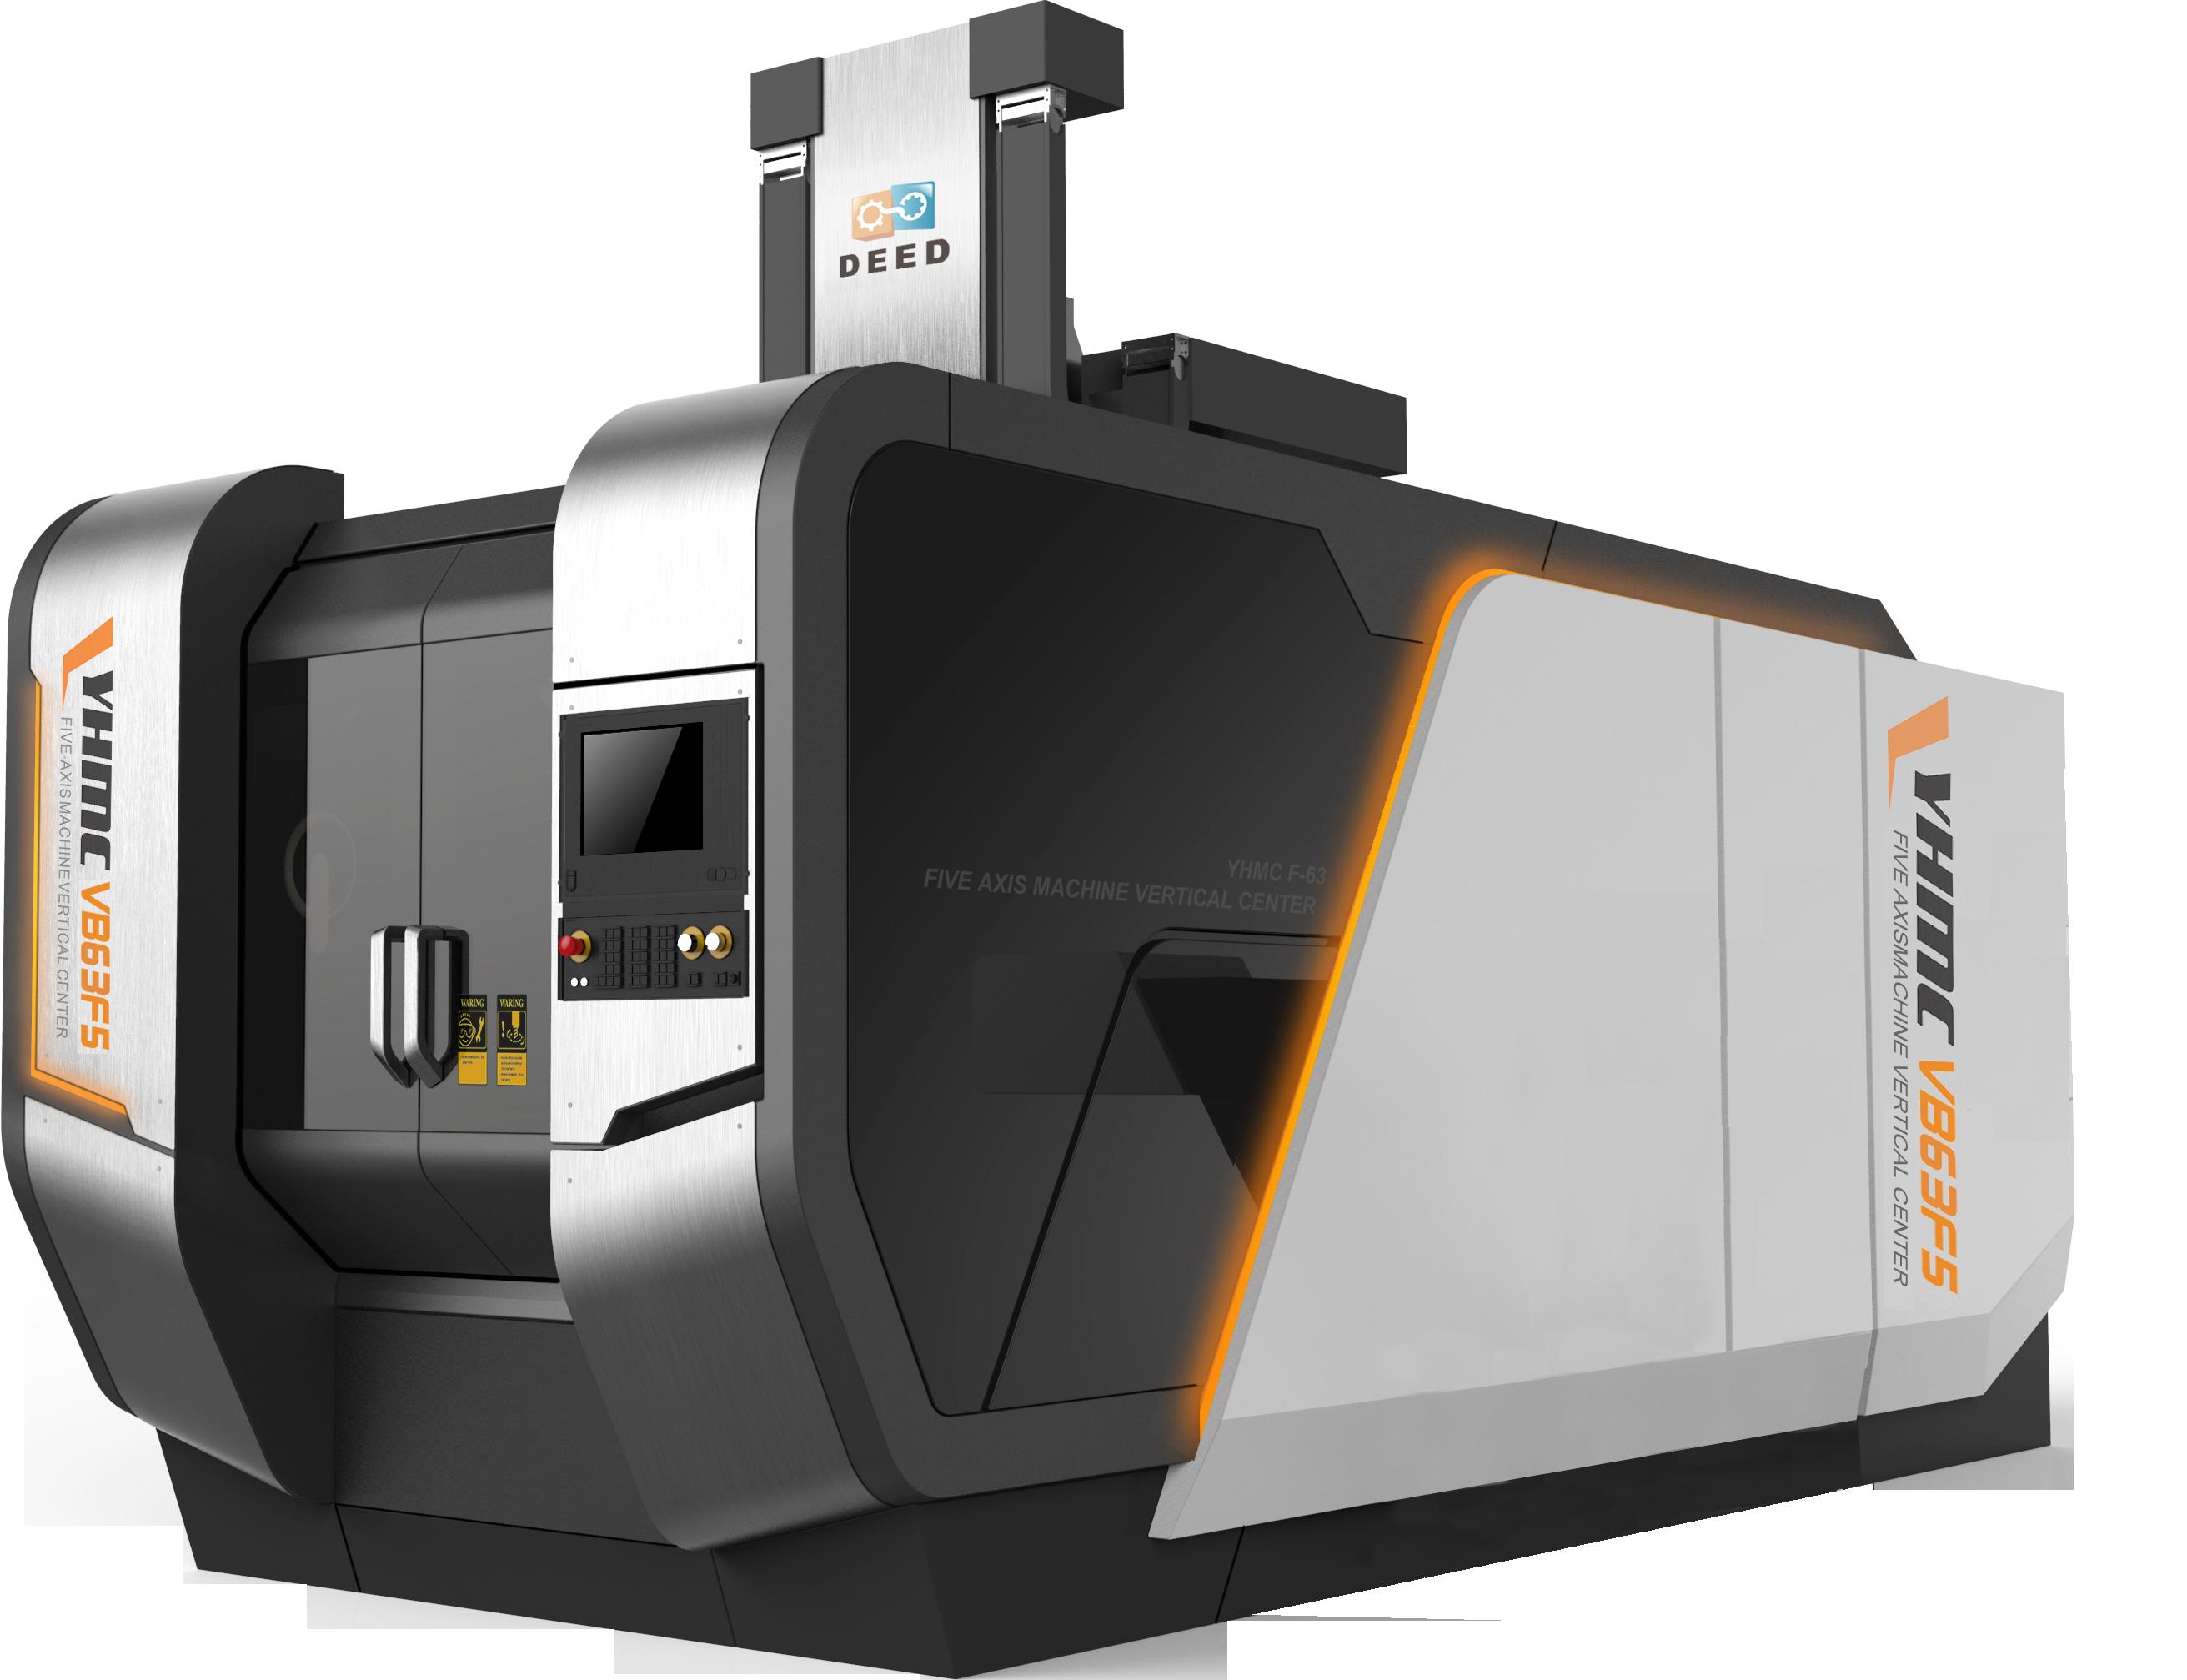 5 Axis Simulation CNC Machining Center VB63F5 Manufacturers, 5 Axis Simulation CNC Machining Center VB63F5 Factory, Supply 5 Axis Simulation CNC Machining Center VB63F5